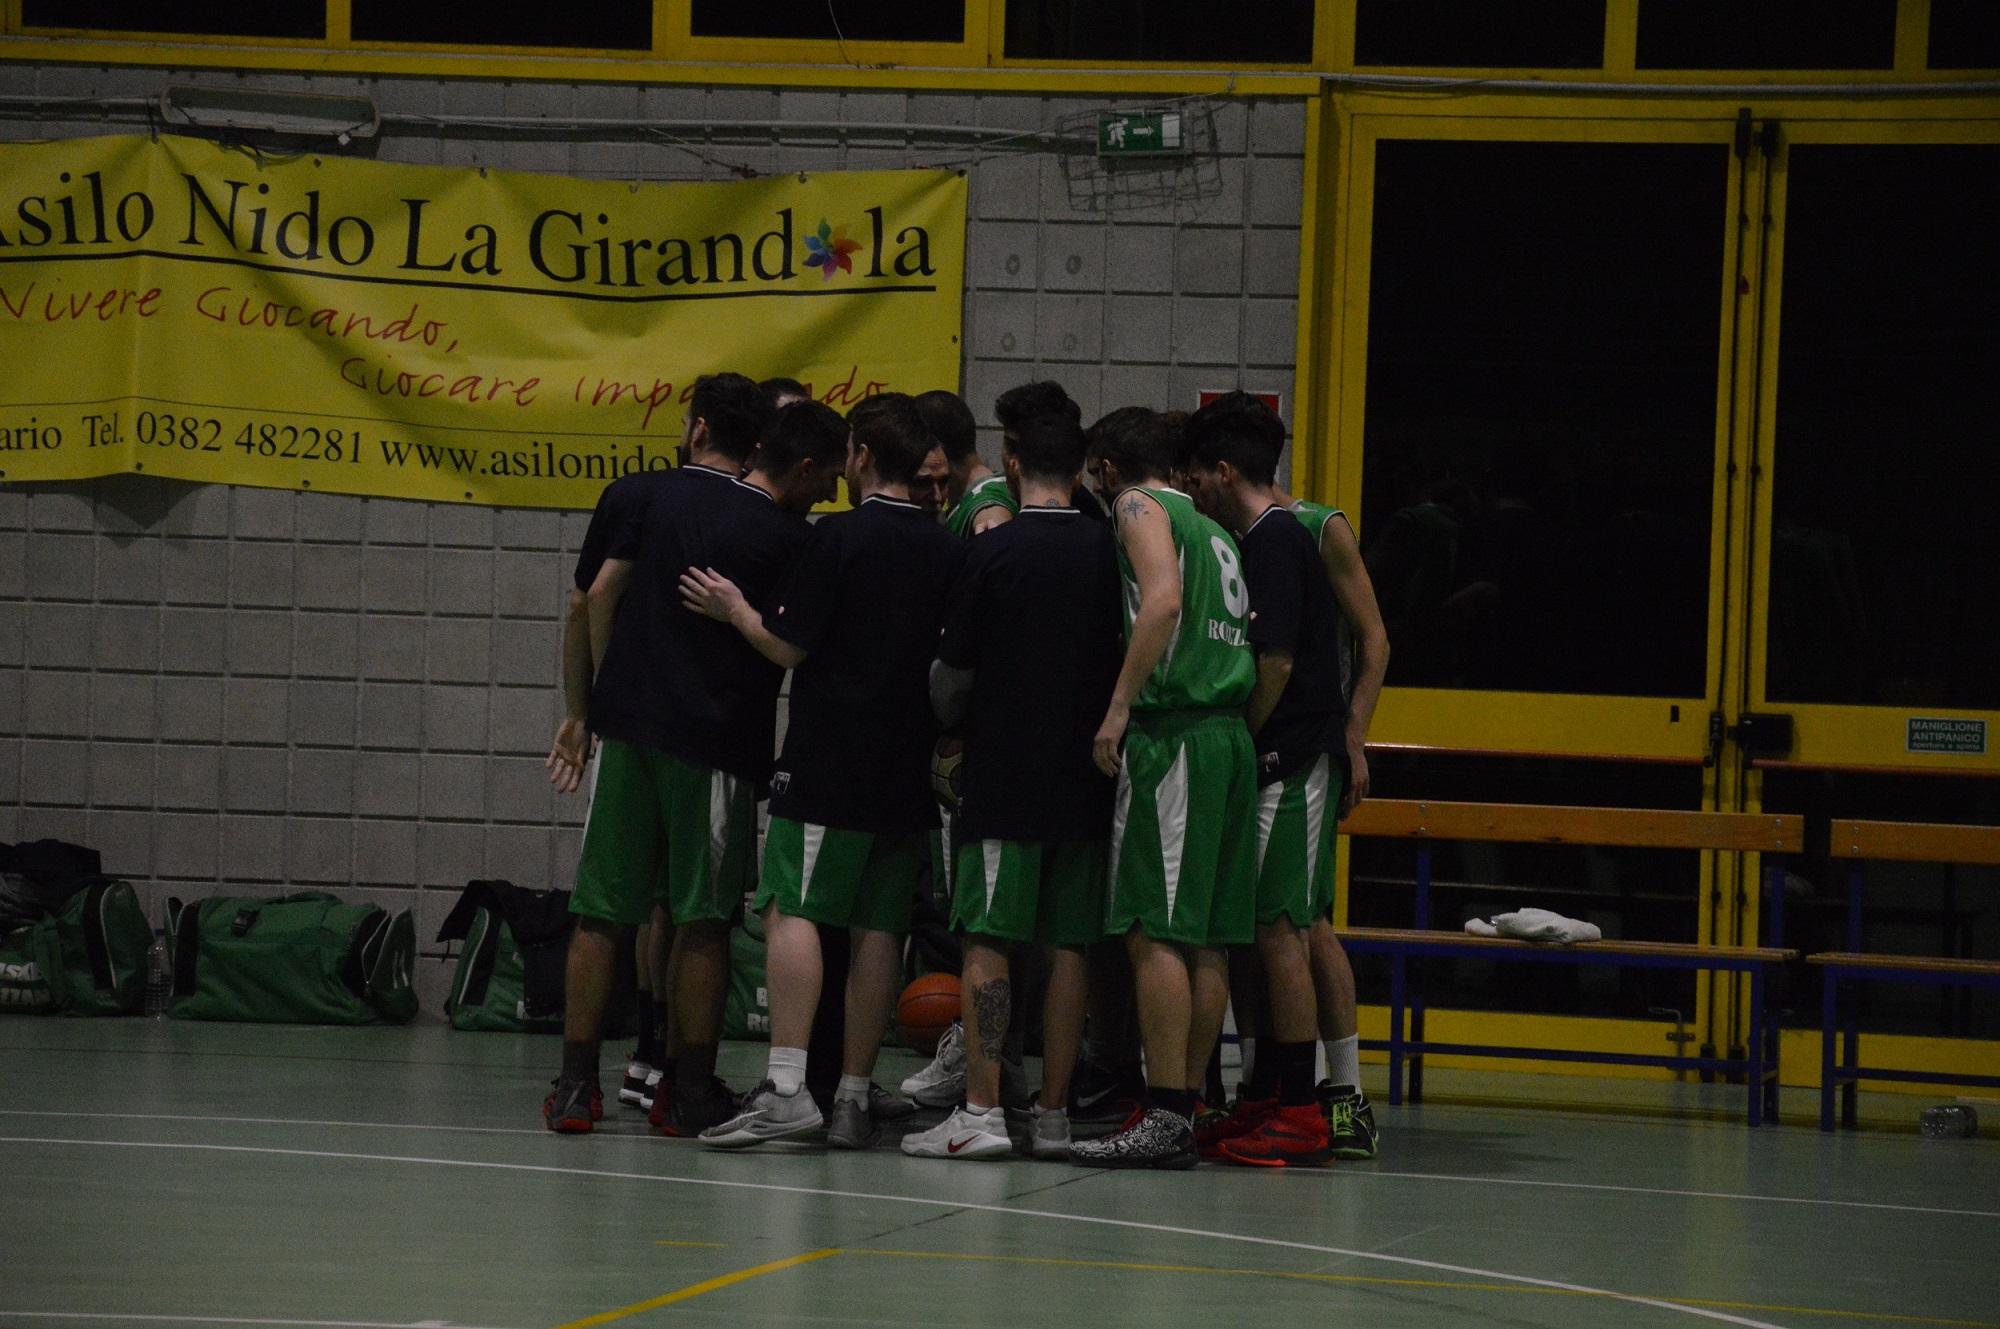 Prima Squadra - Upol vs Rozzano